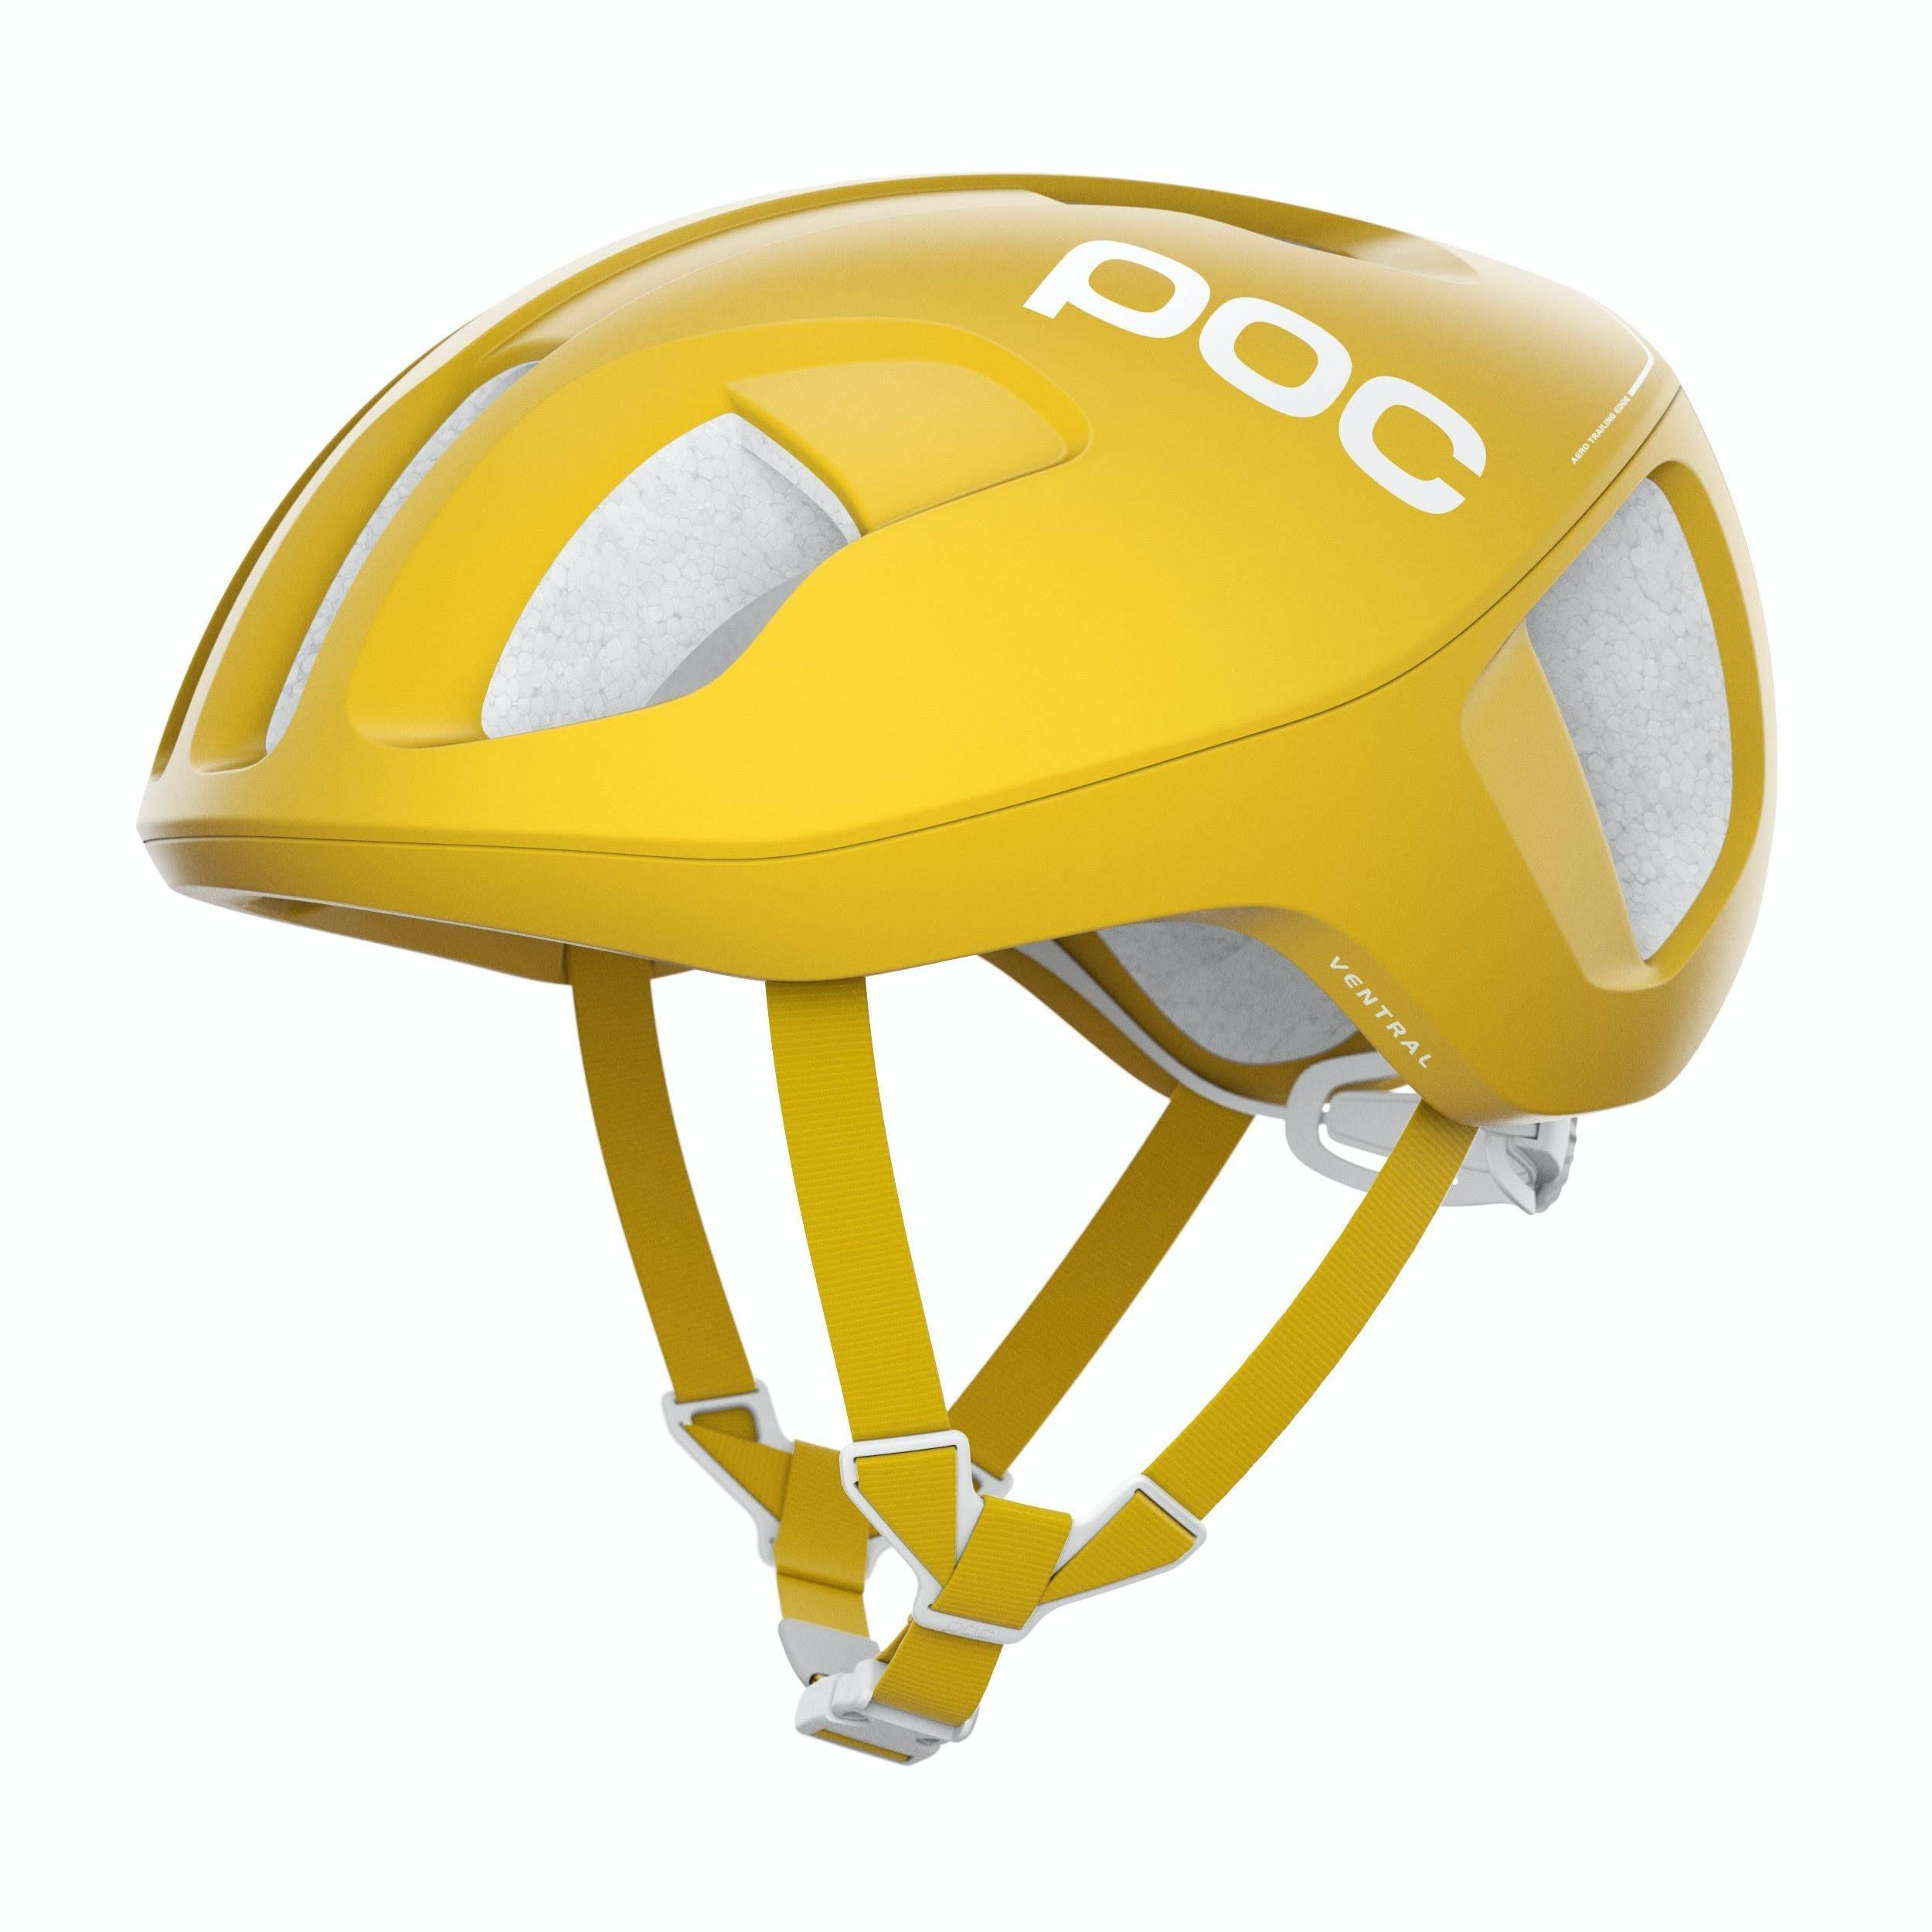 POC Ventral Spin Helmet - Sulphite Yellow - Small